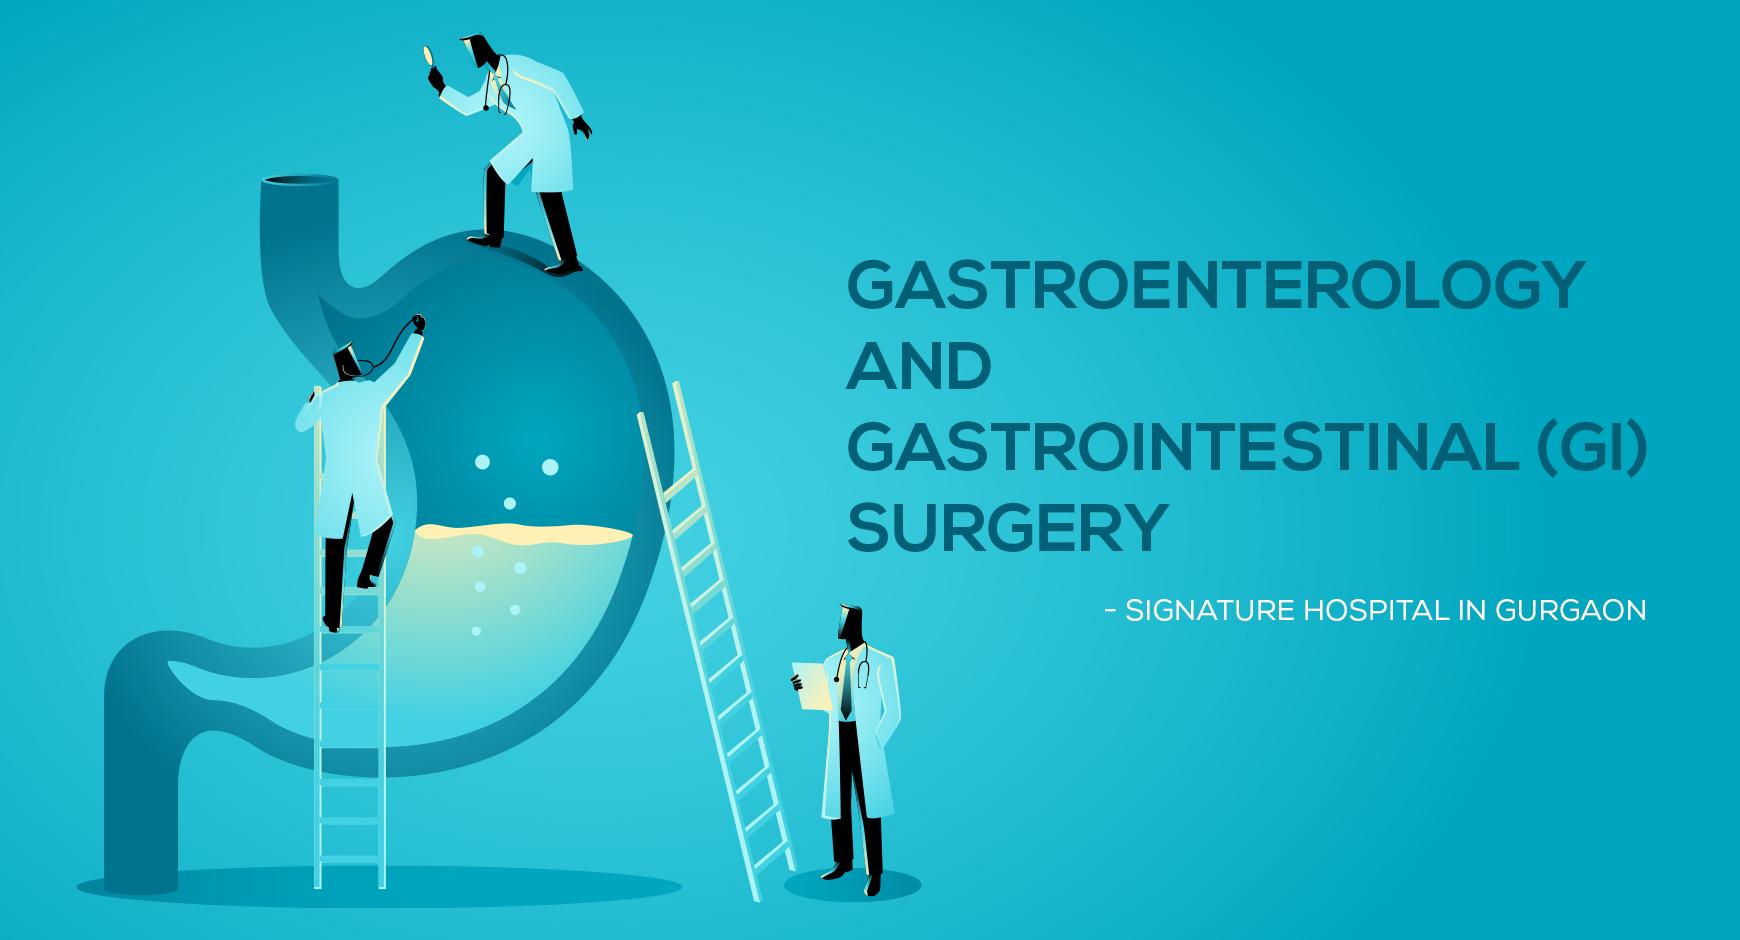 Gastroenterology & Gastrointestinal (GI) Surgery in Gurgaon